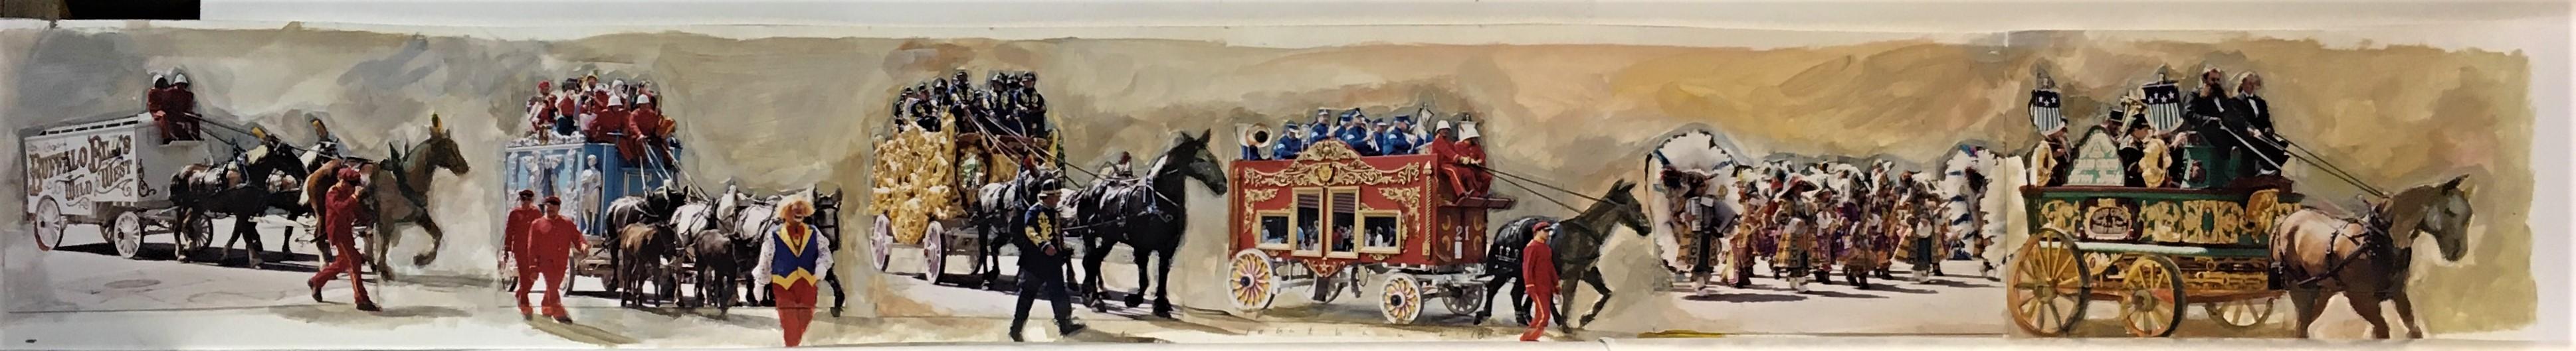 Circus Parade 4